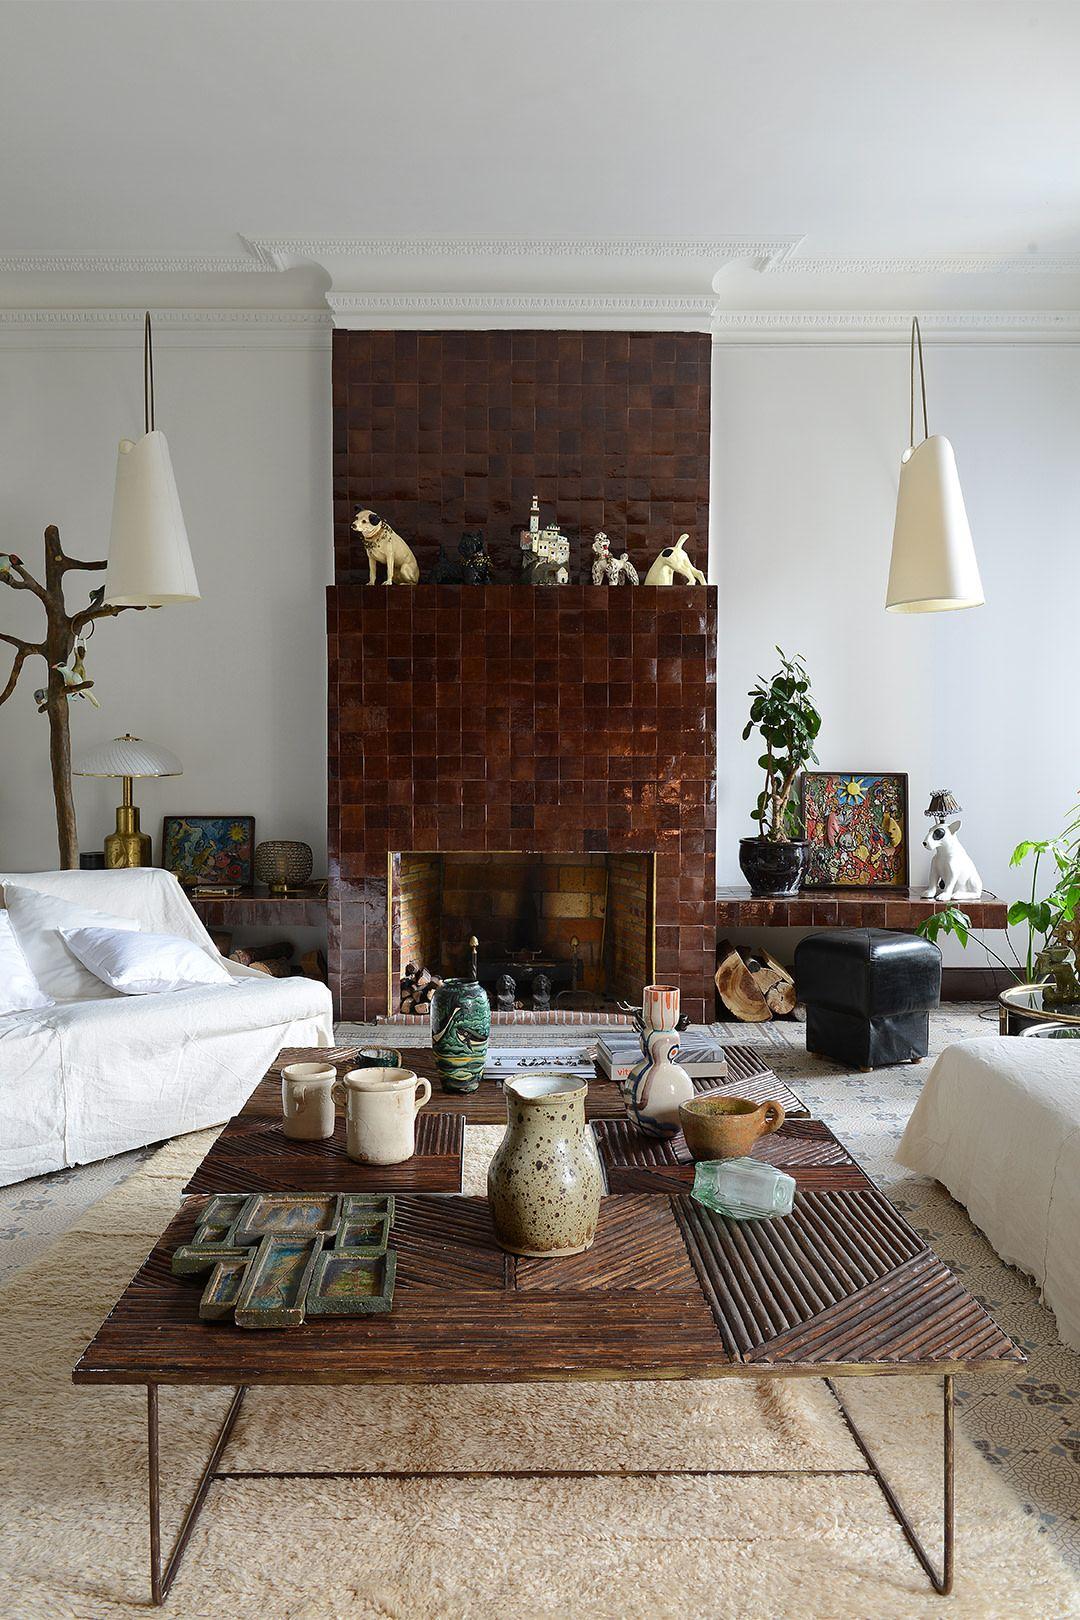 Photo of Annick Lestrohan's Marseille Home is Peak Mediterranean Vibes